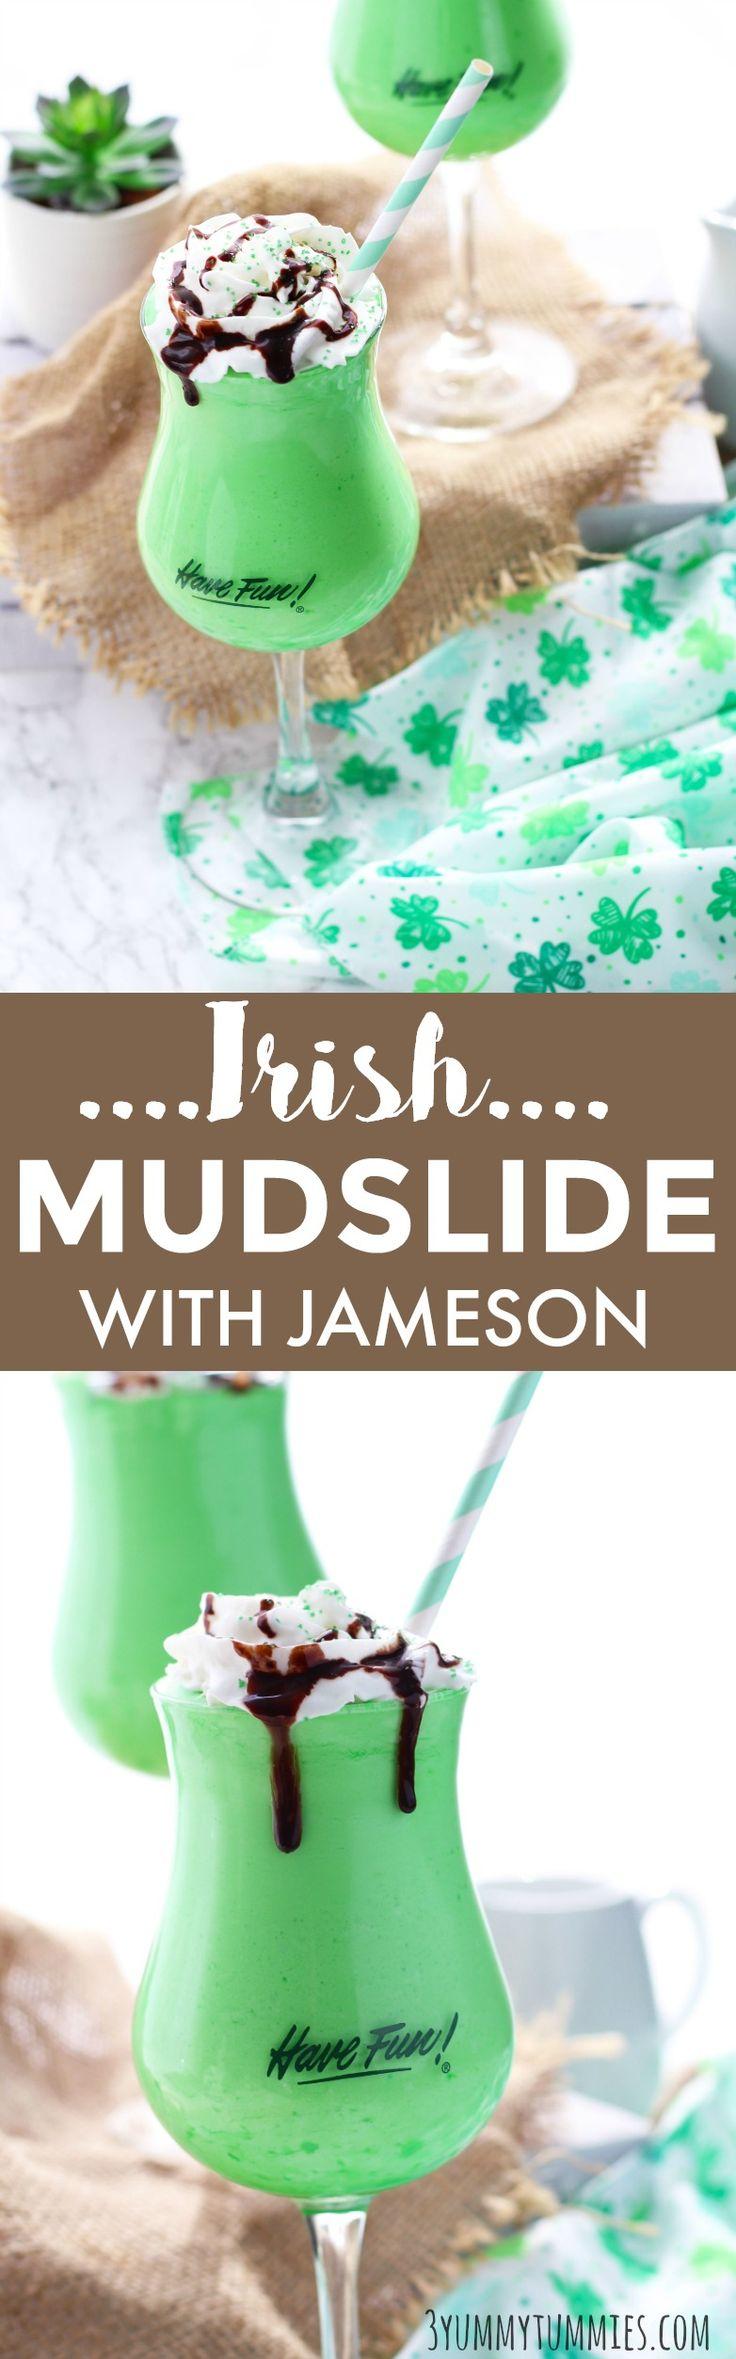 Irish Mudslide with Jameson via @https://www.pinterest.com/3yummytummies